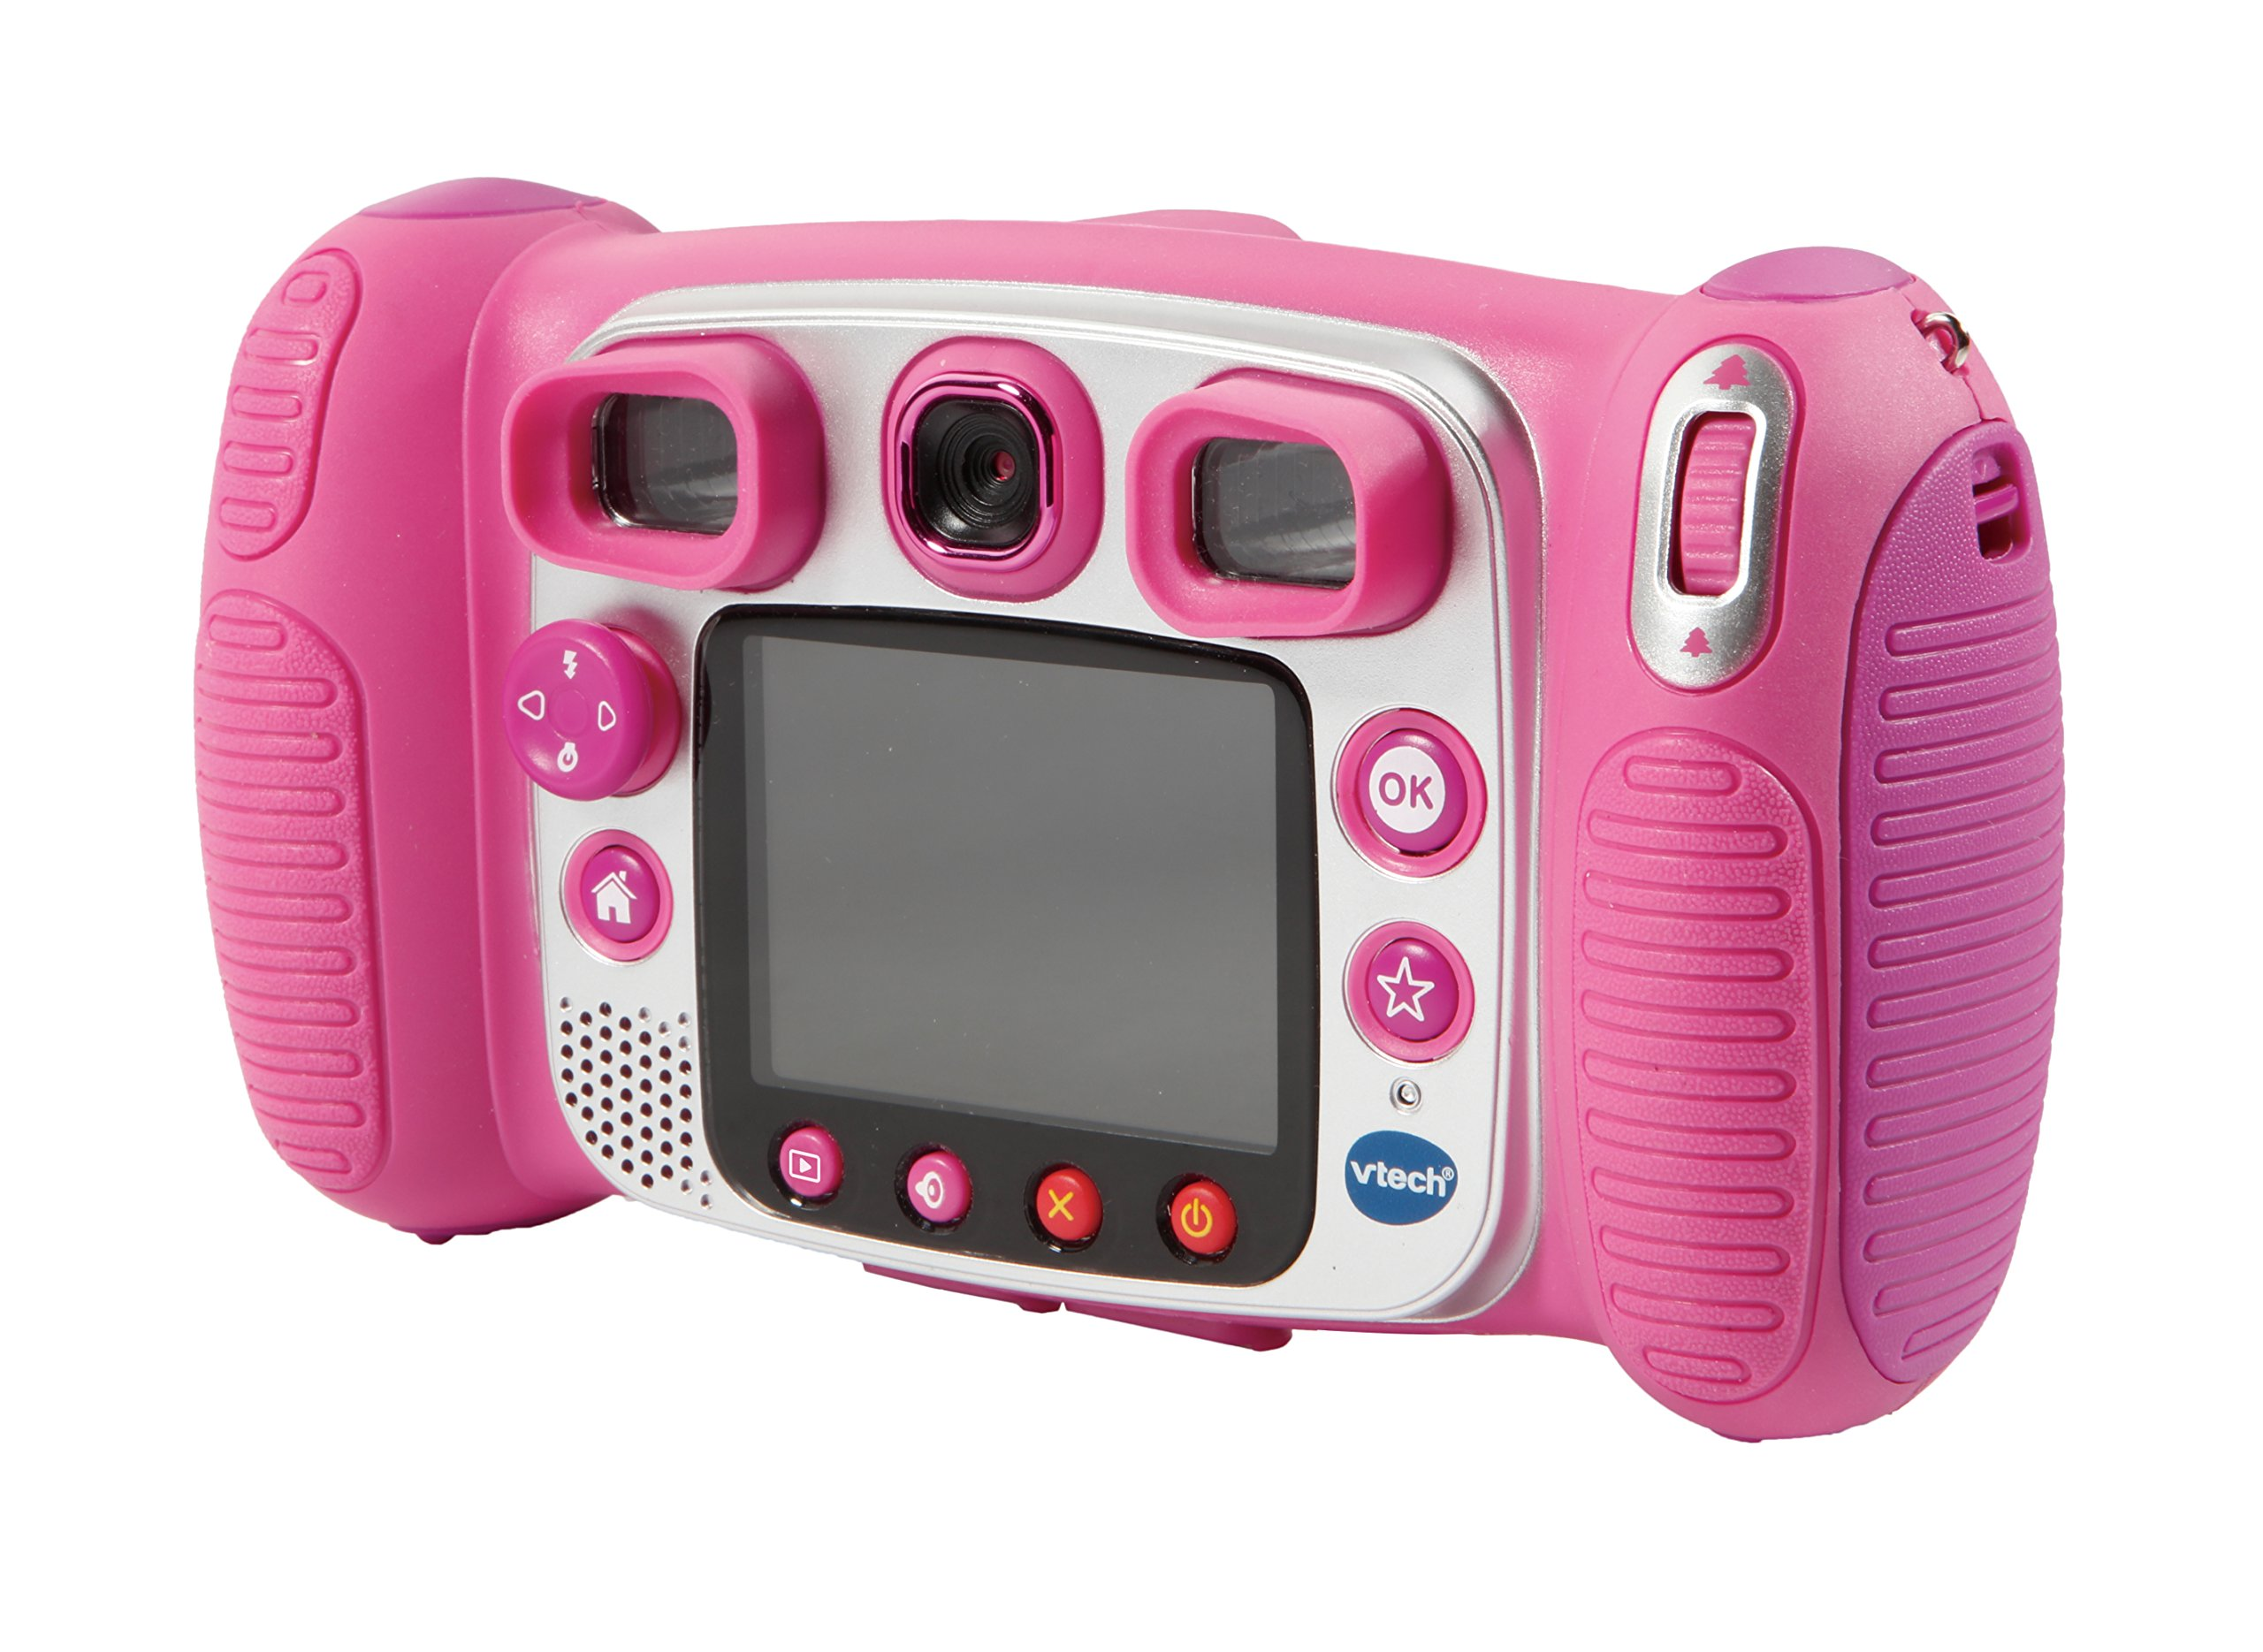 VTech Kidizoom Duo 5.0 Camera Pink by VTech (Image #3)